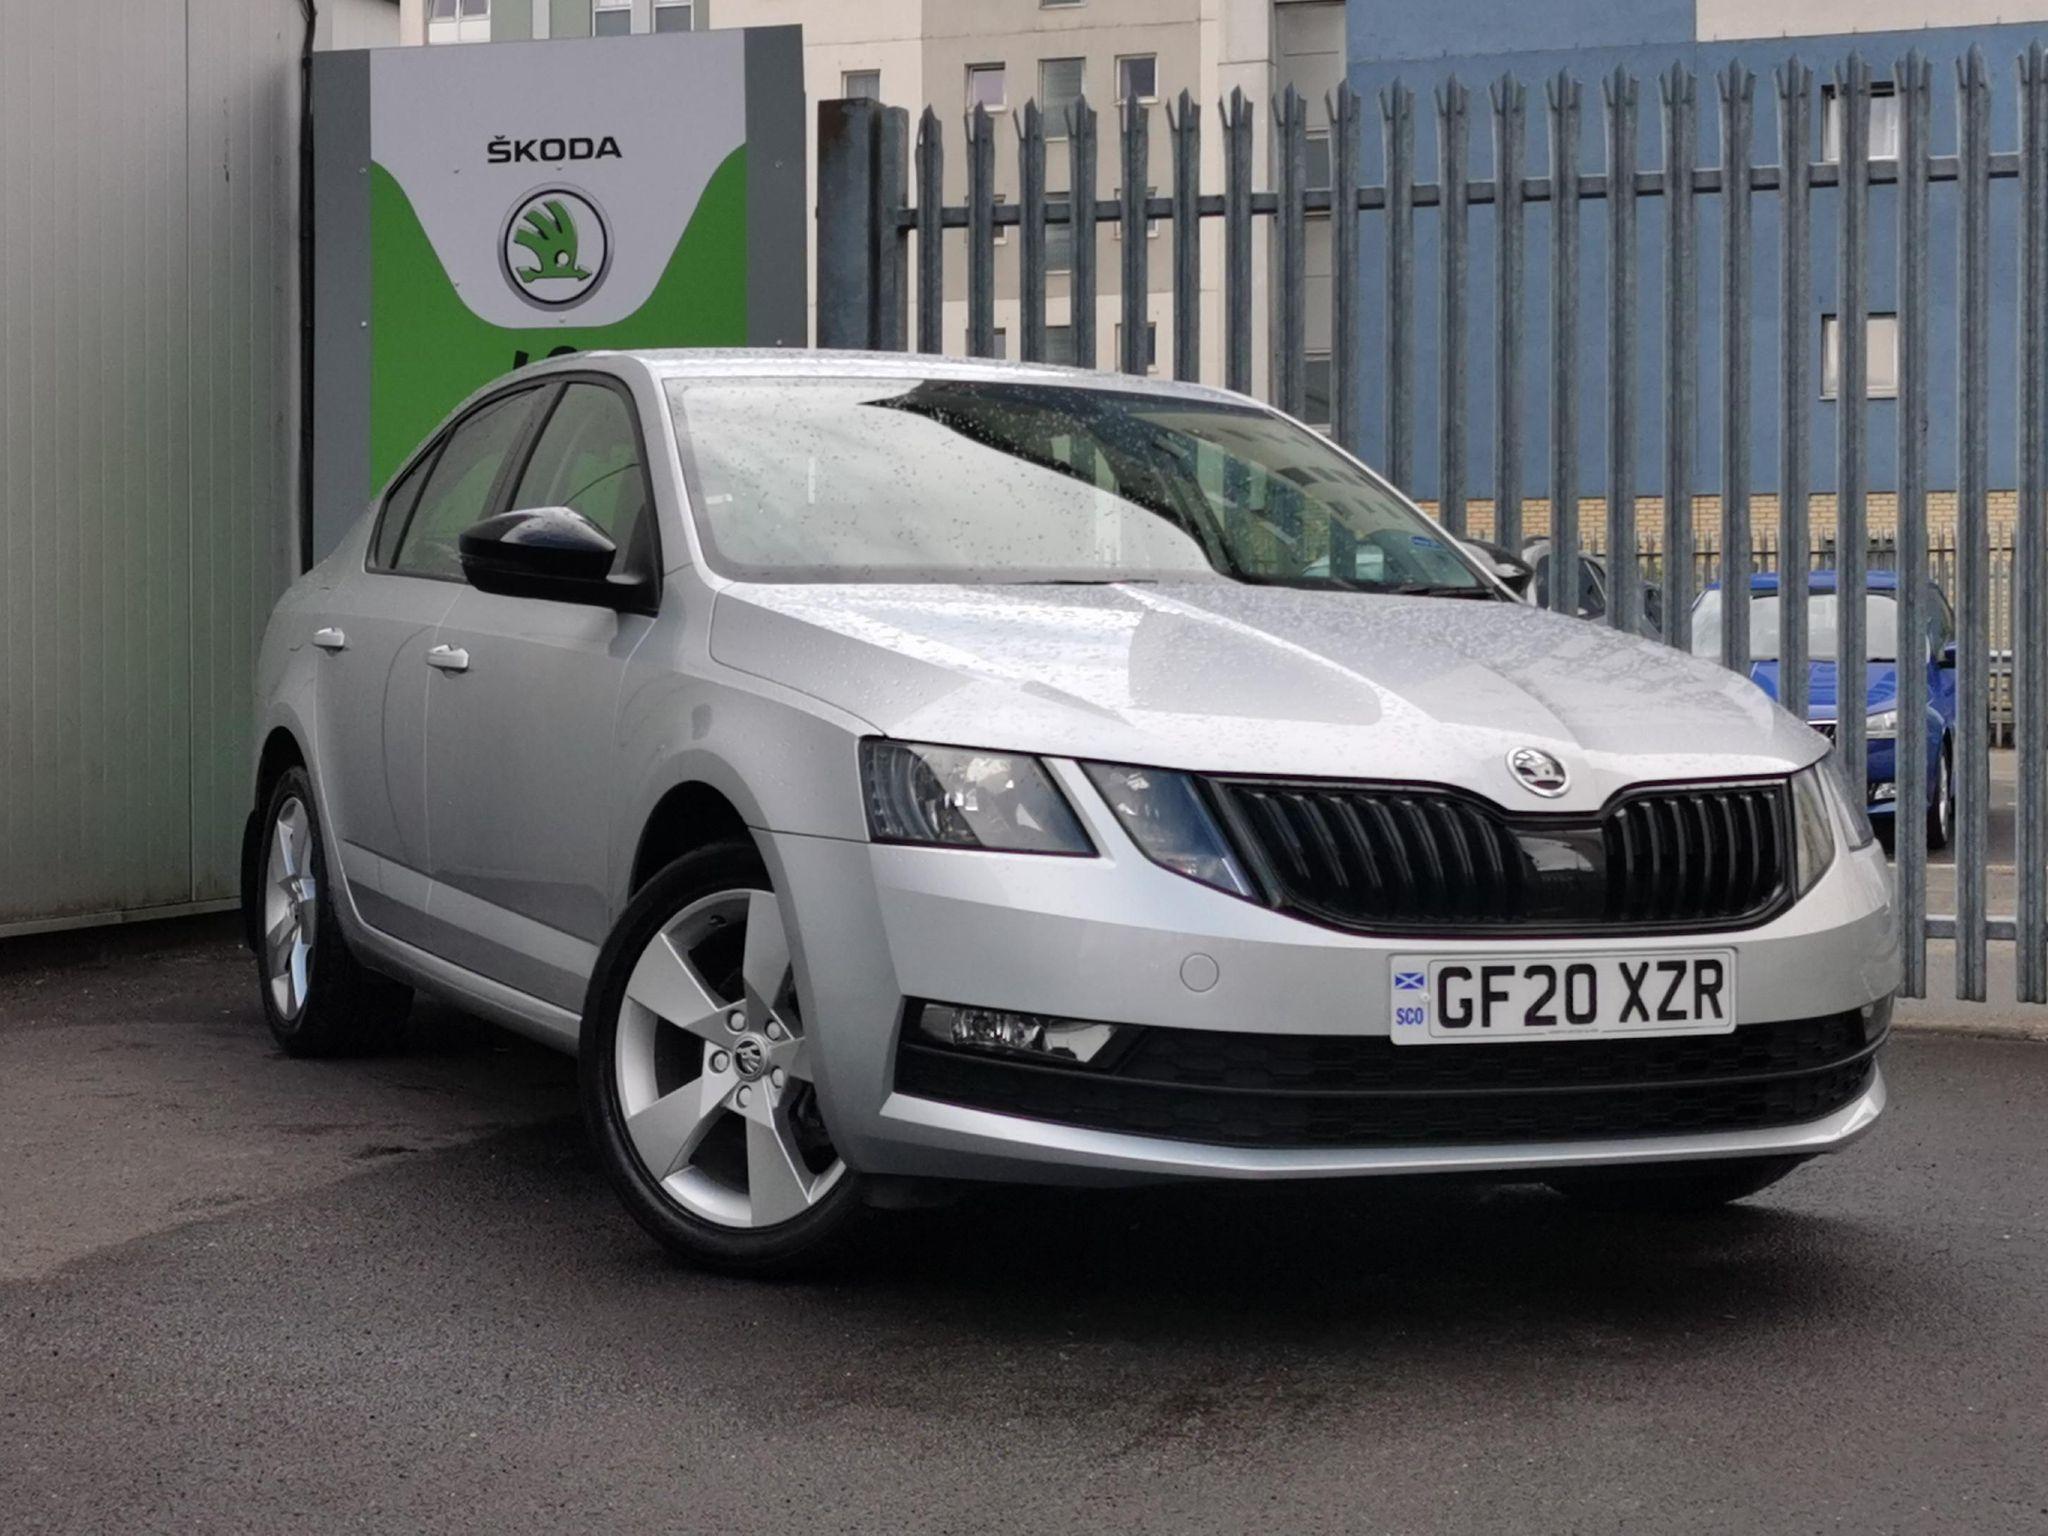 ŠKODA Octavia Hatchback 1.5 TSI SE Drive ACT (150ps) DSG